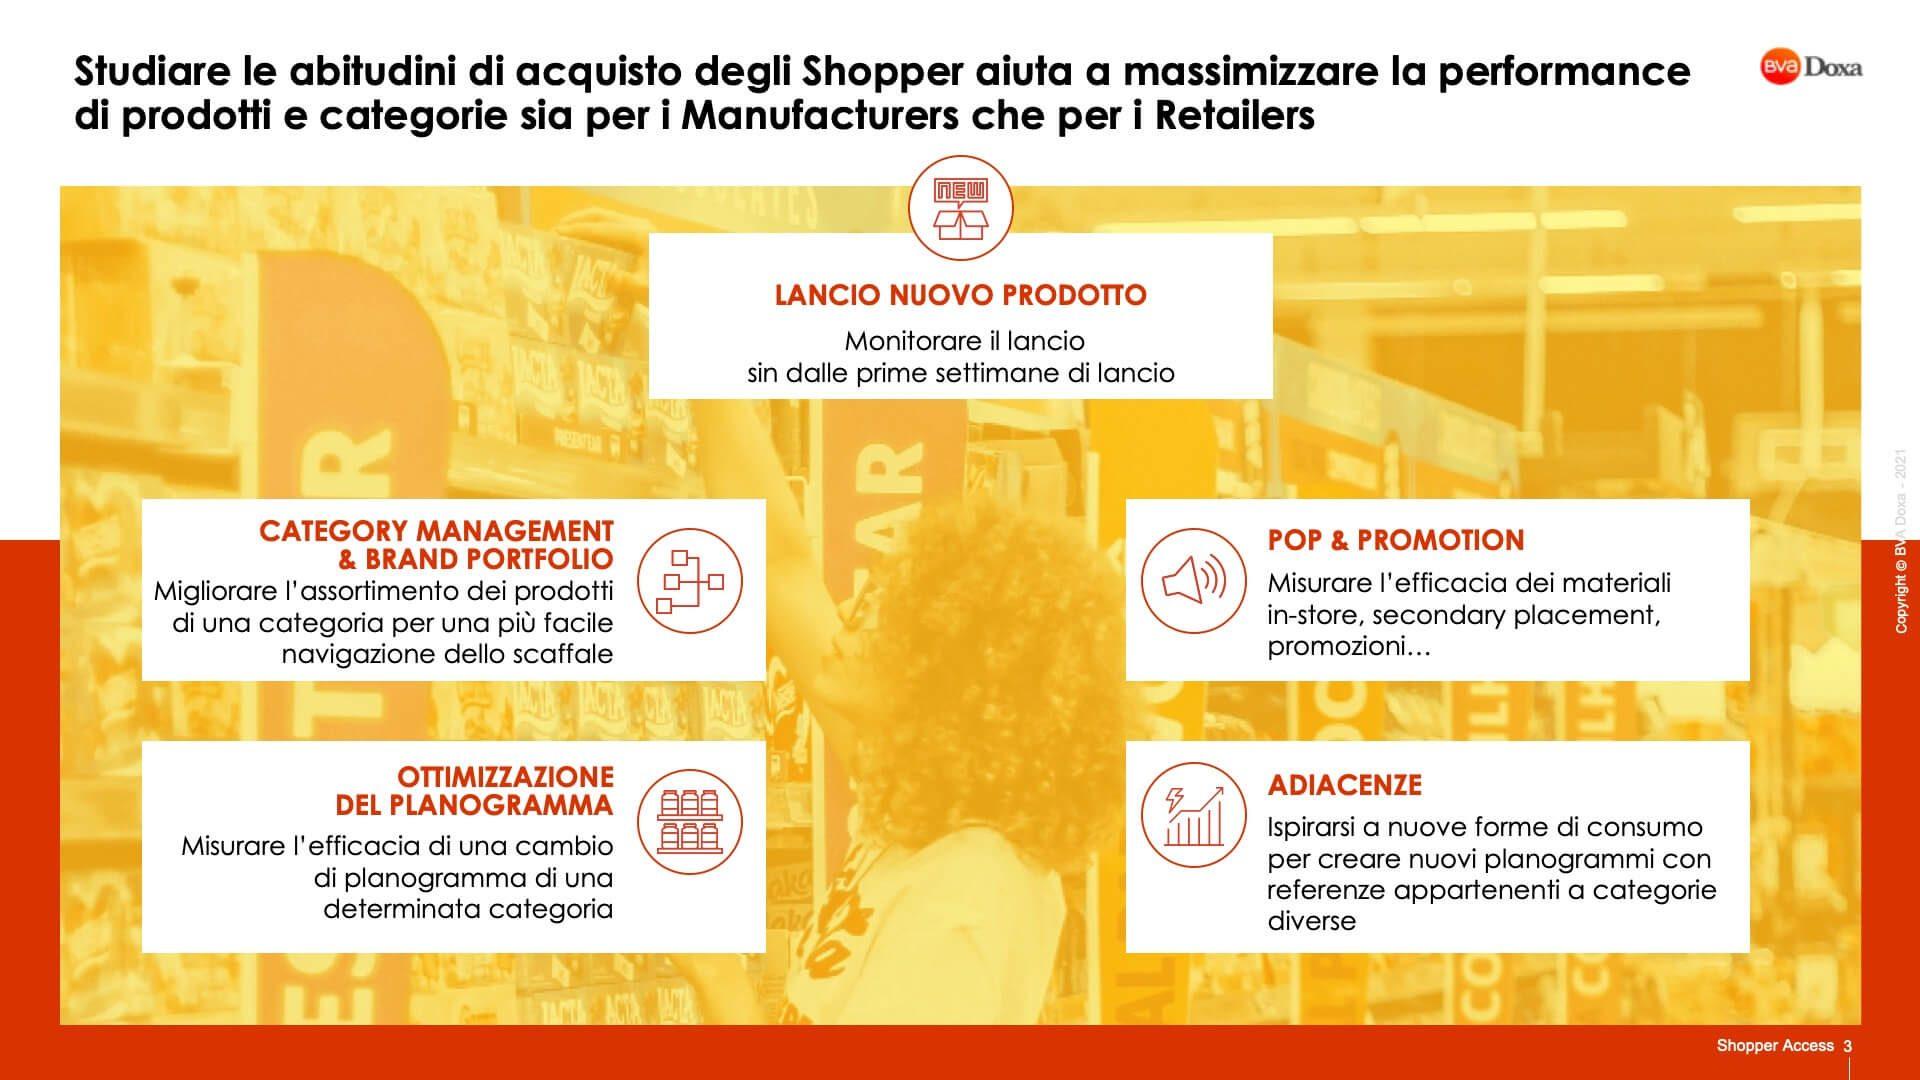 Shopper Access 03